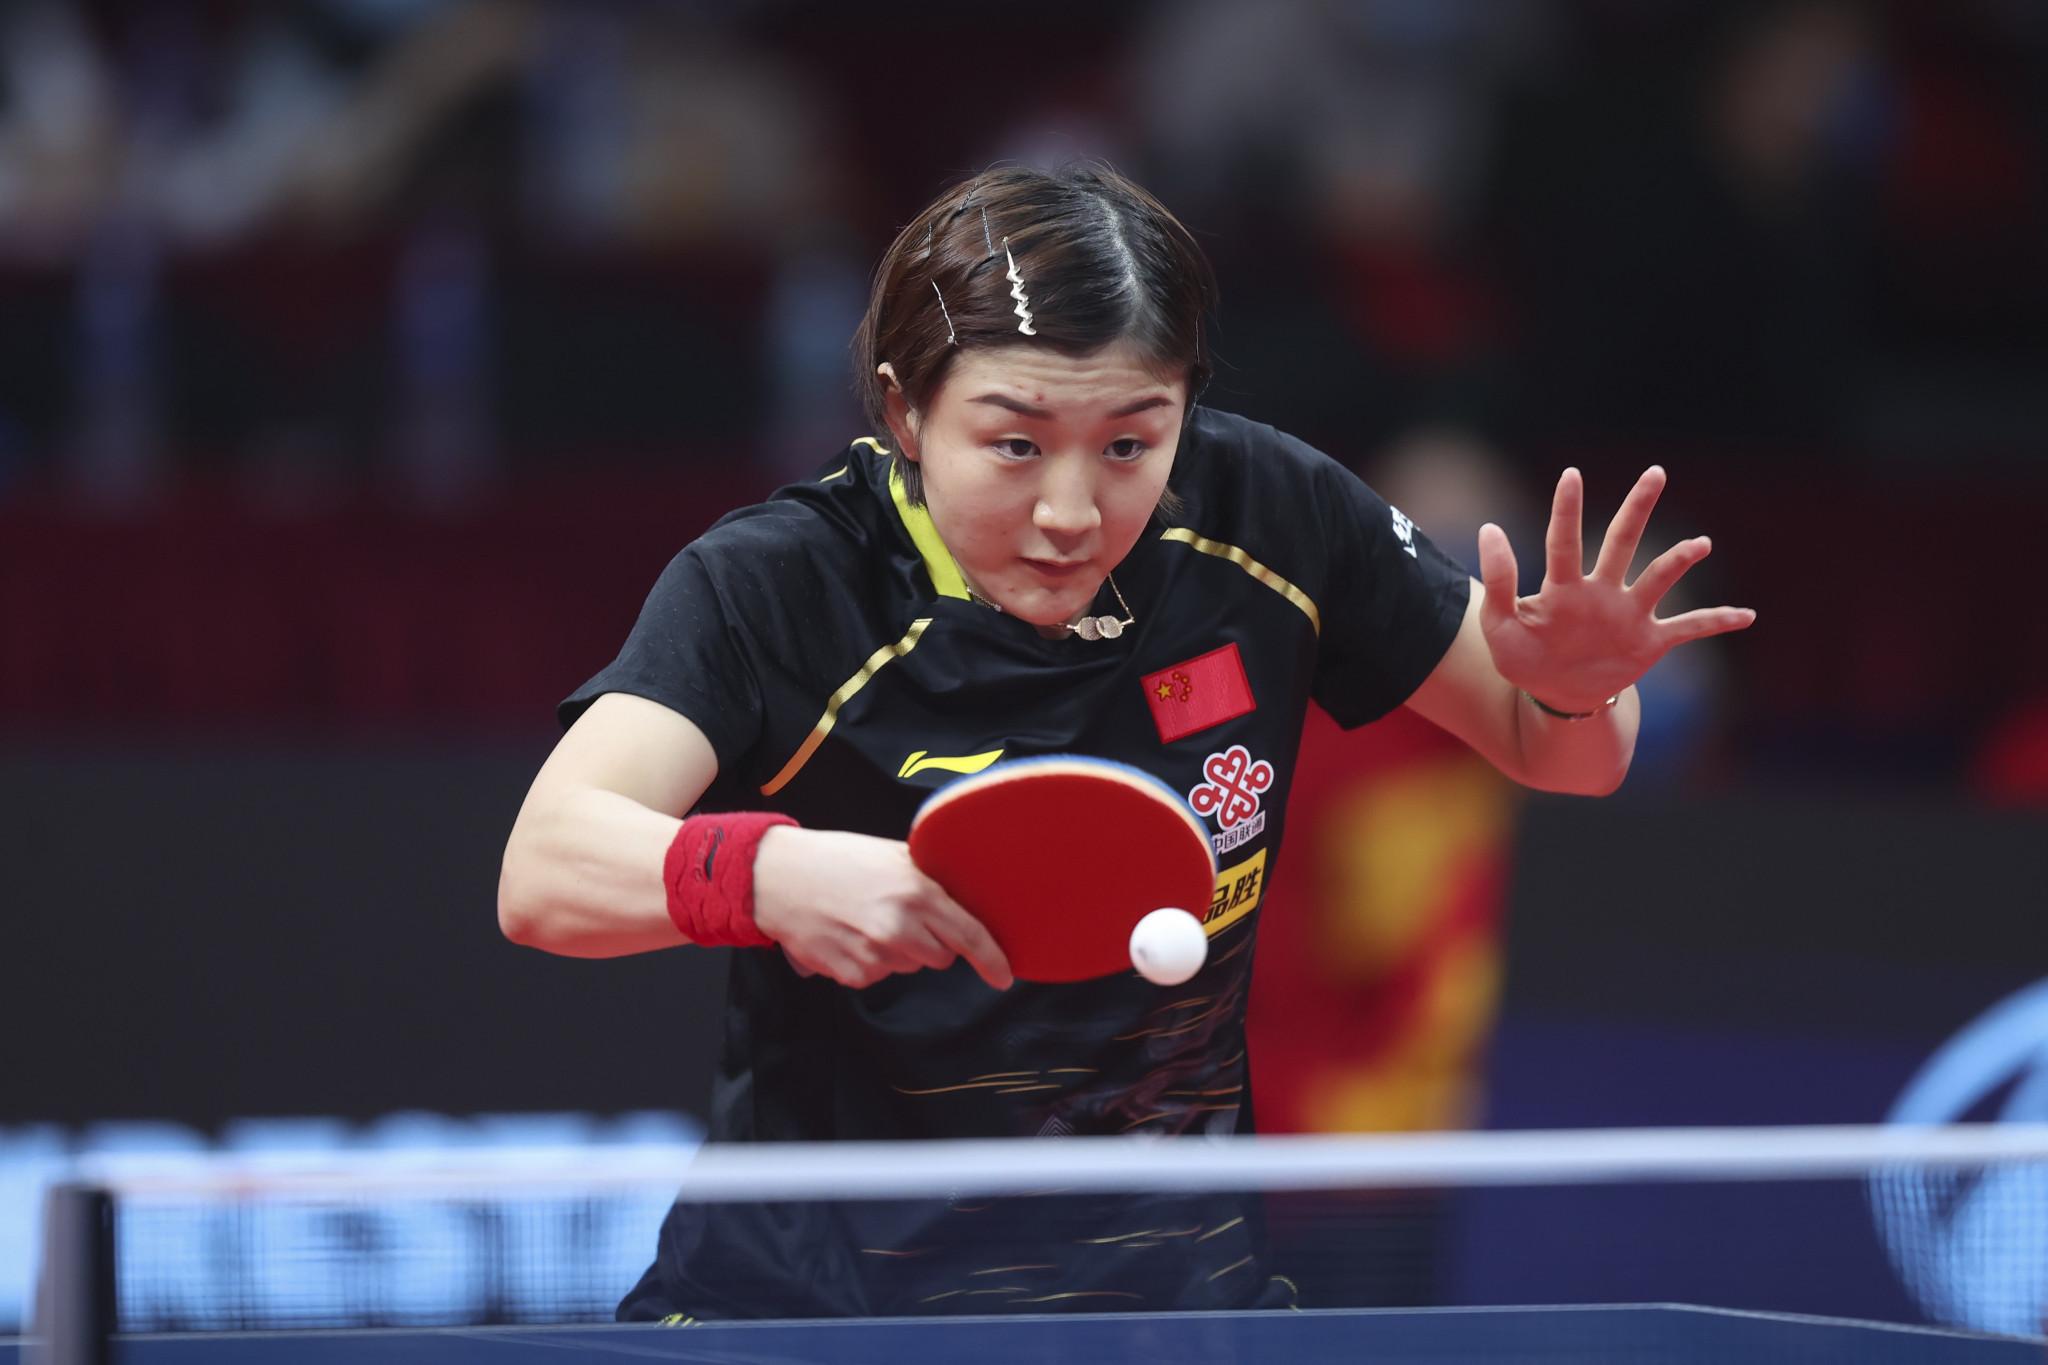 Macau set to host WTT promotional showcase featuring 32 table tennis stars